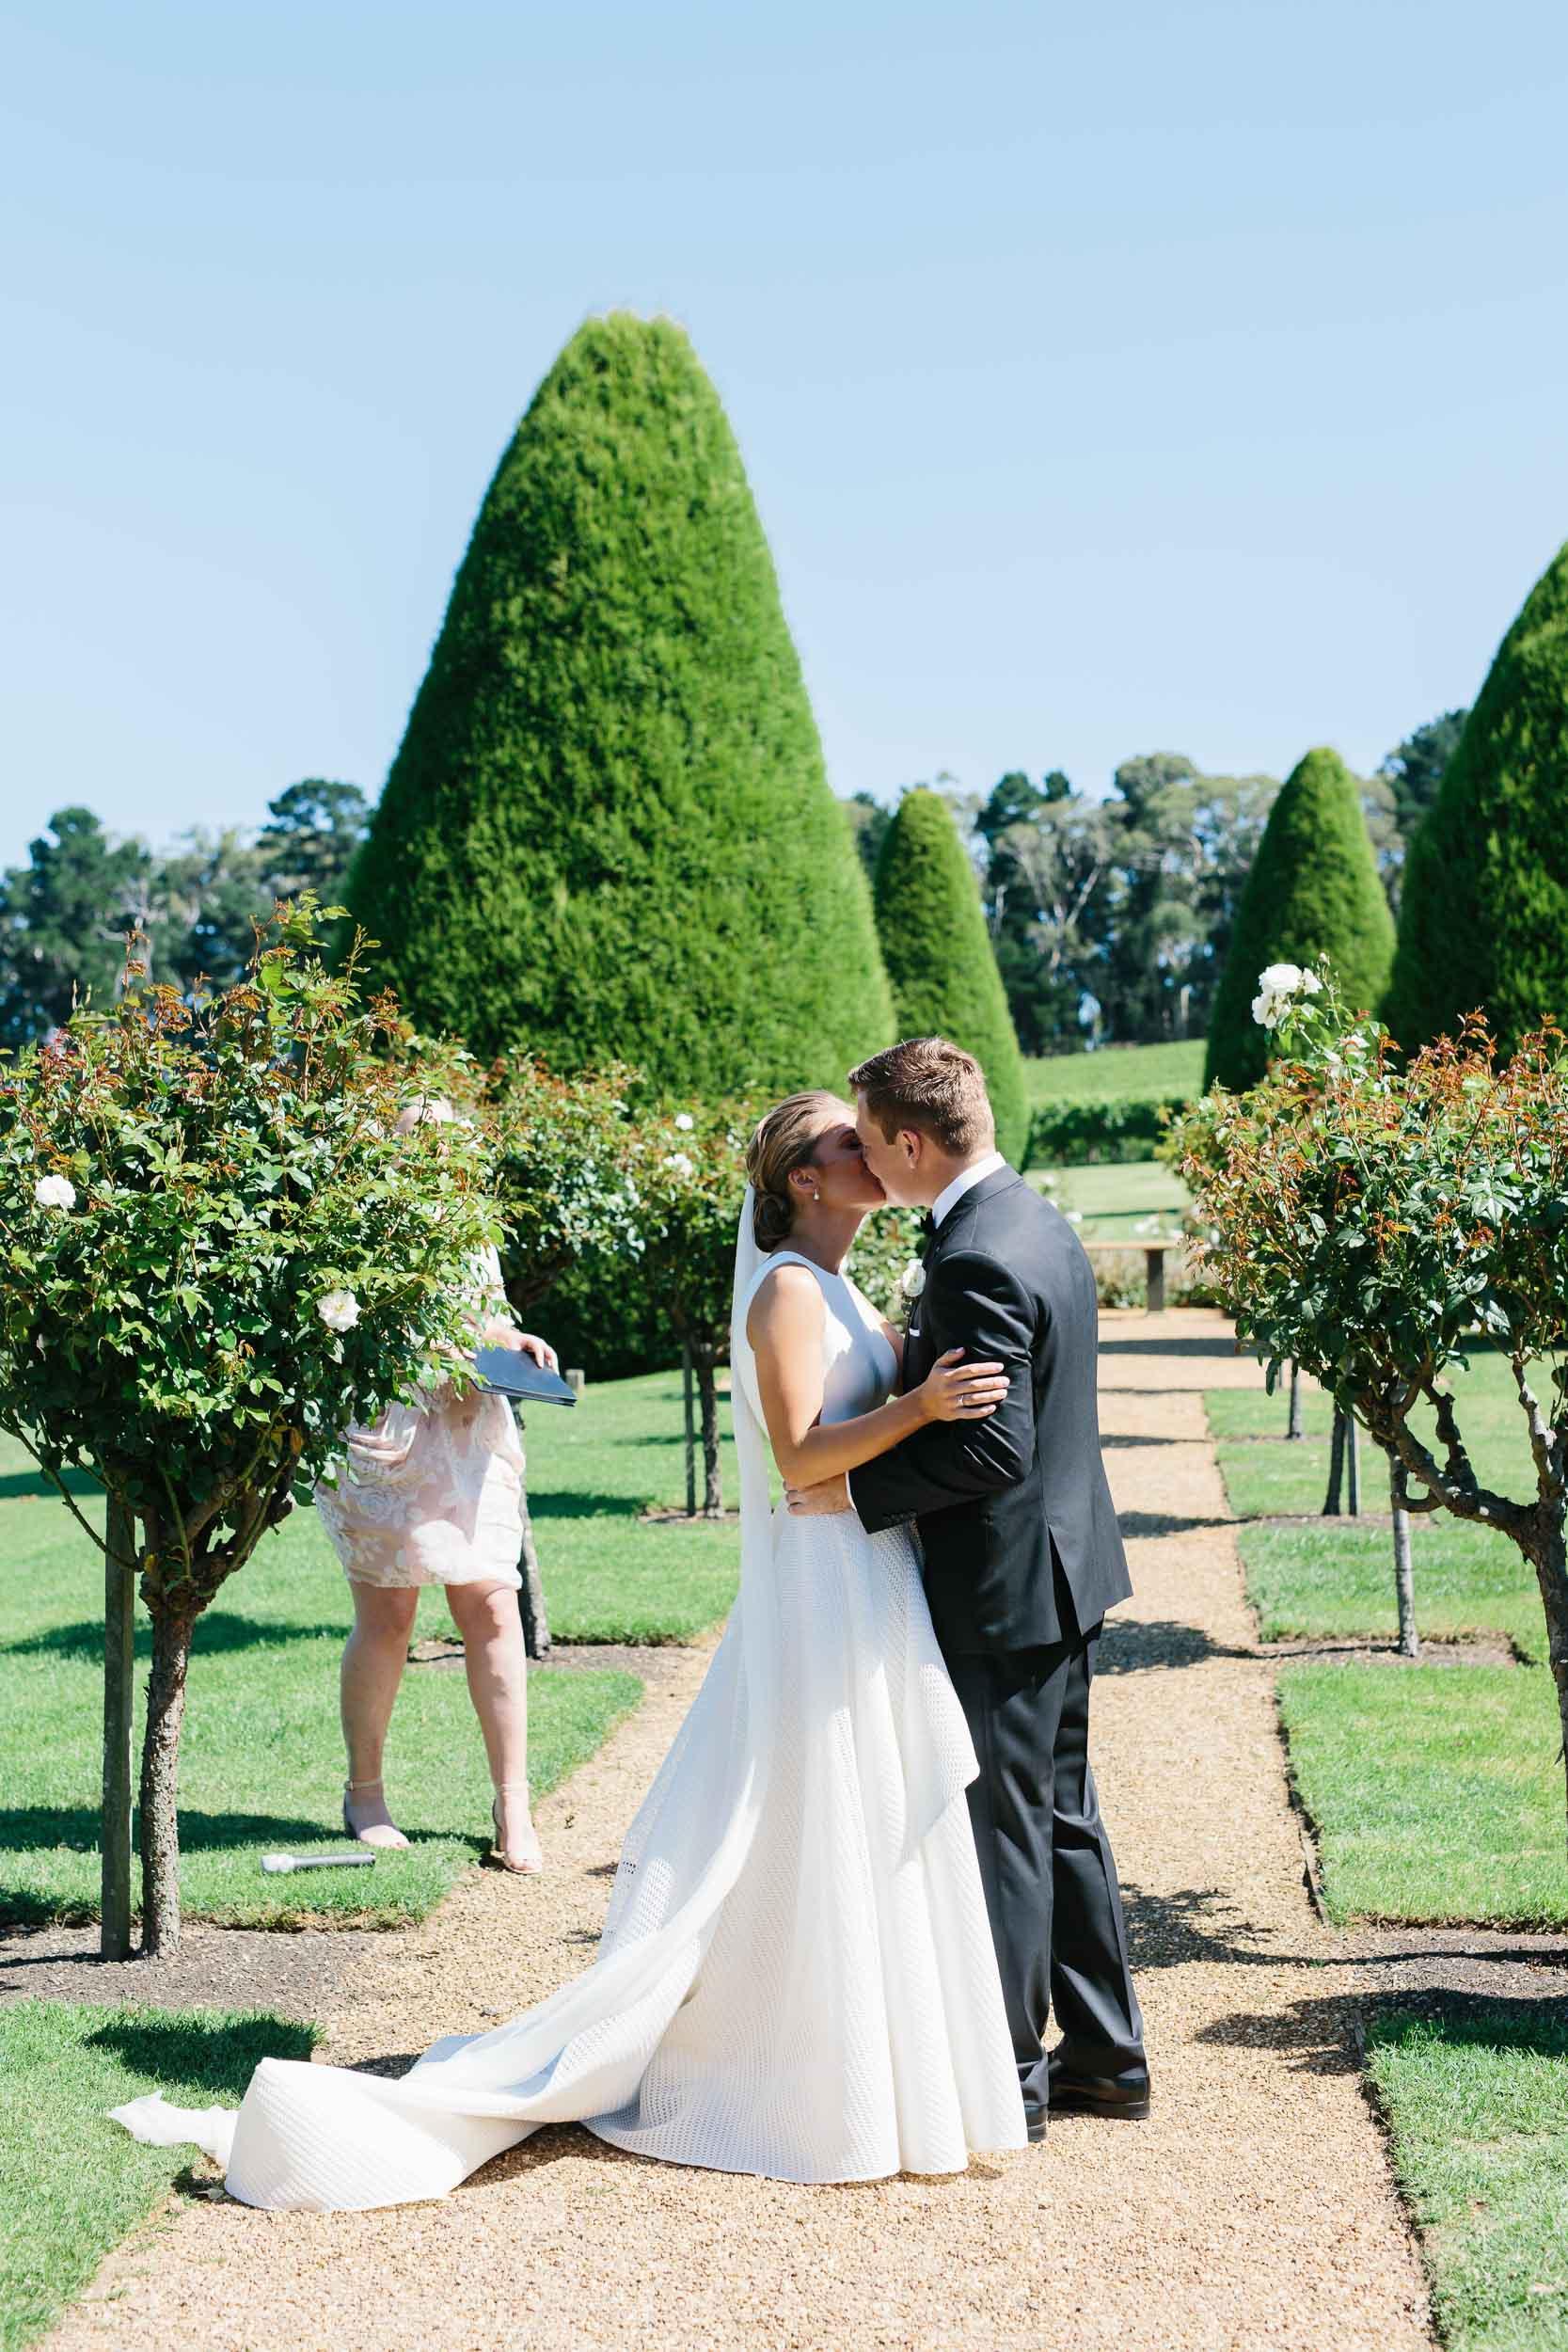 Kas-Richards-Mornington-Peninsula-Wedding-Lindenderry-Red-Hill-273.jpg